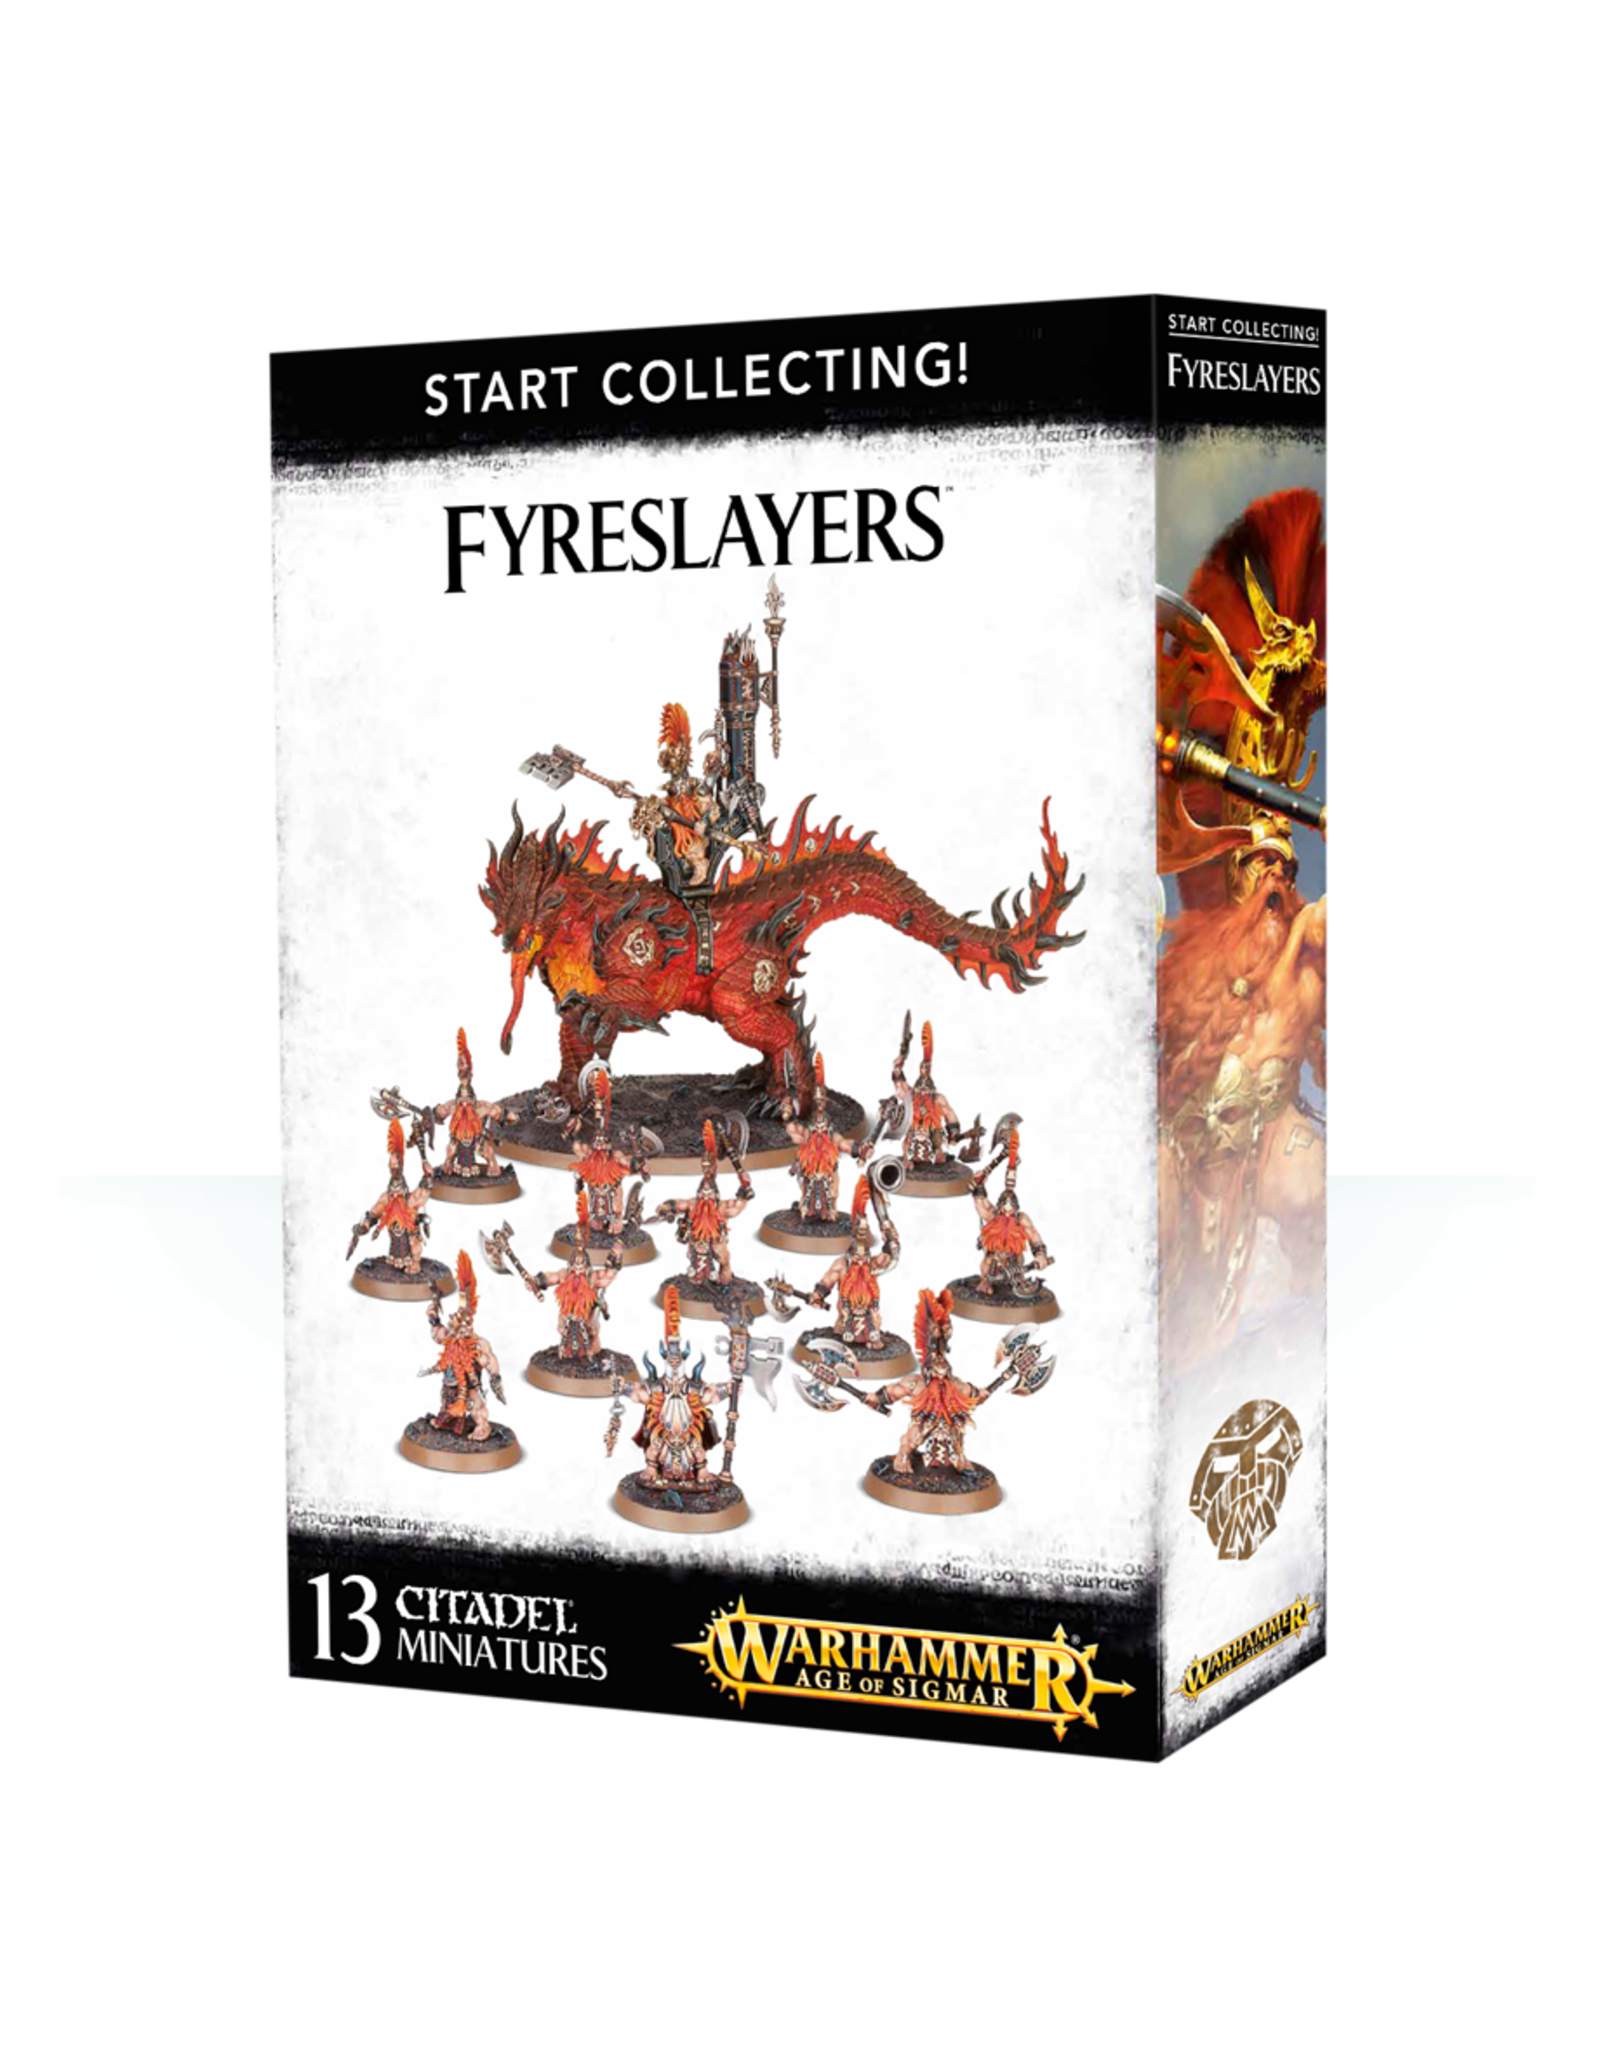 Warhammer Age of Sigmar Start Collecting! Fyreslayers